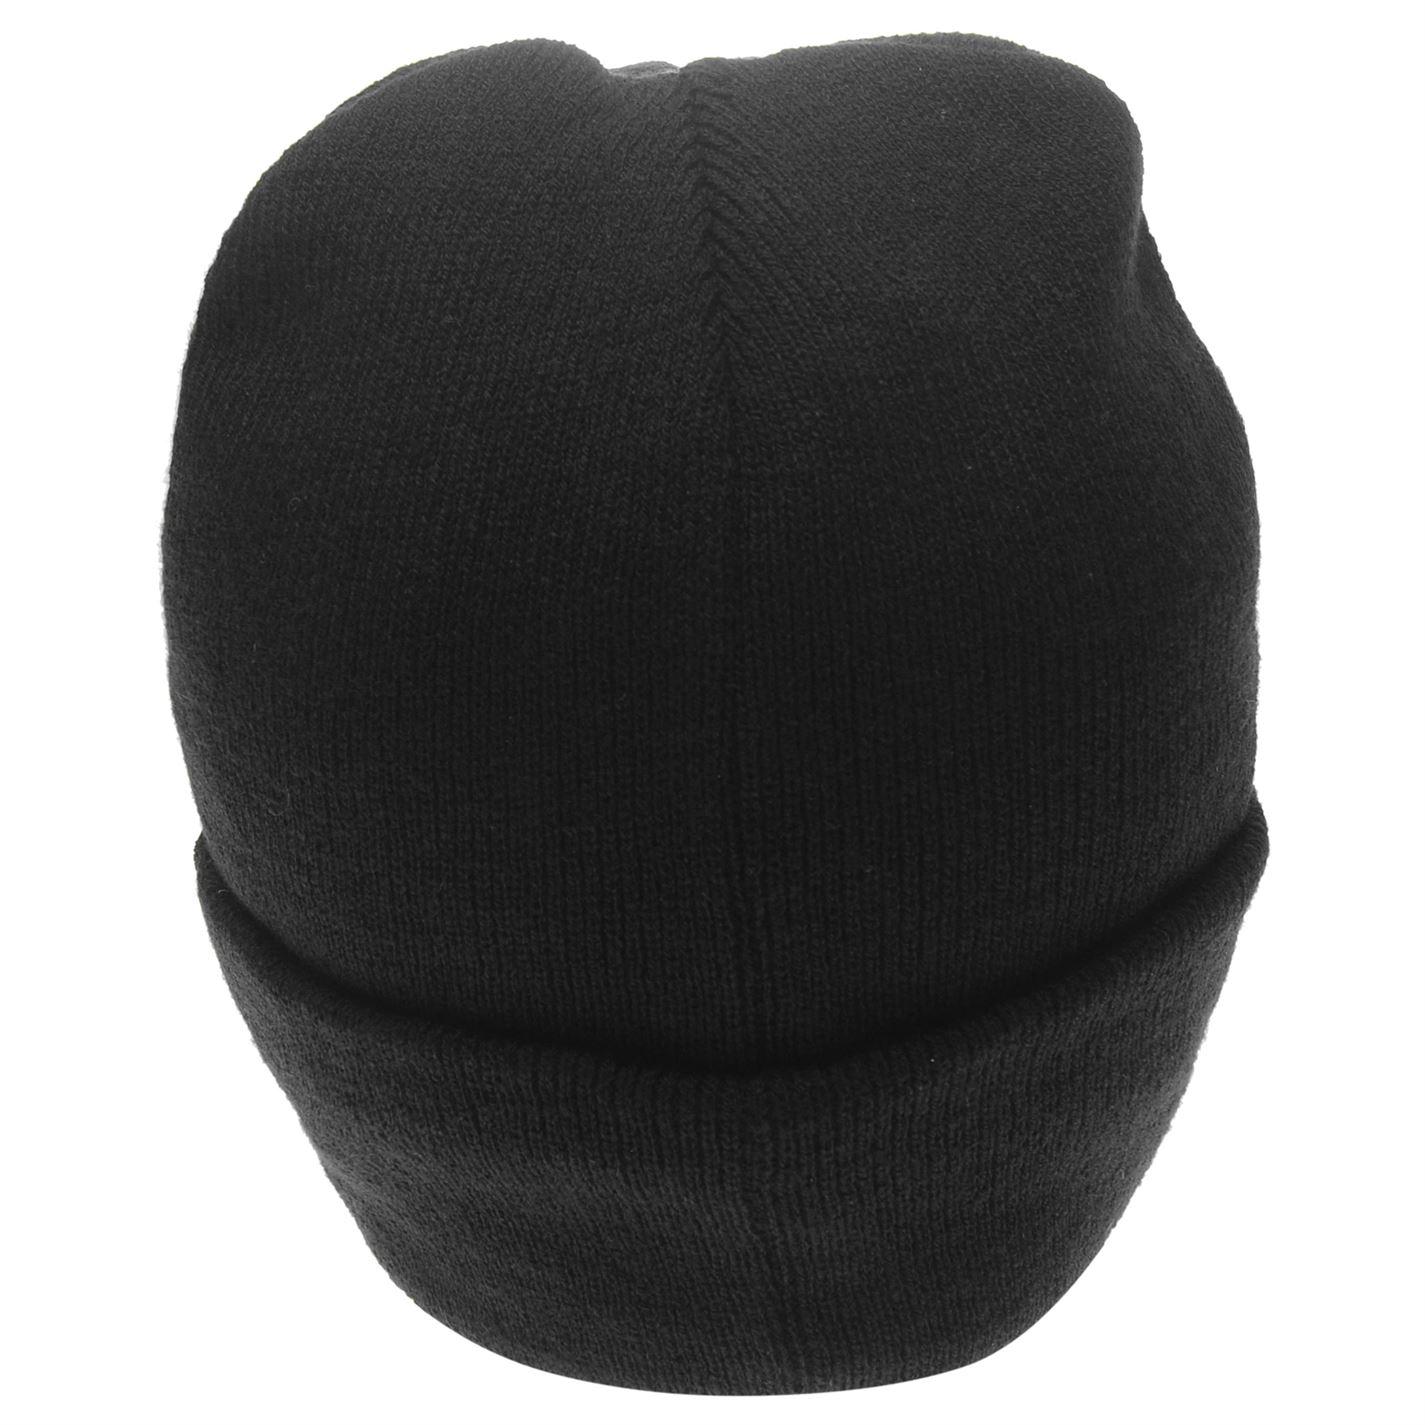 497bd4f60 Details about Gelert Thinsulate Hat Mens Gents Beanie Winter Warm Knitwear